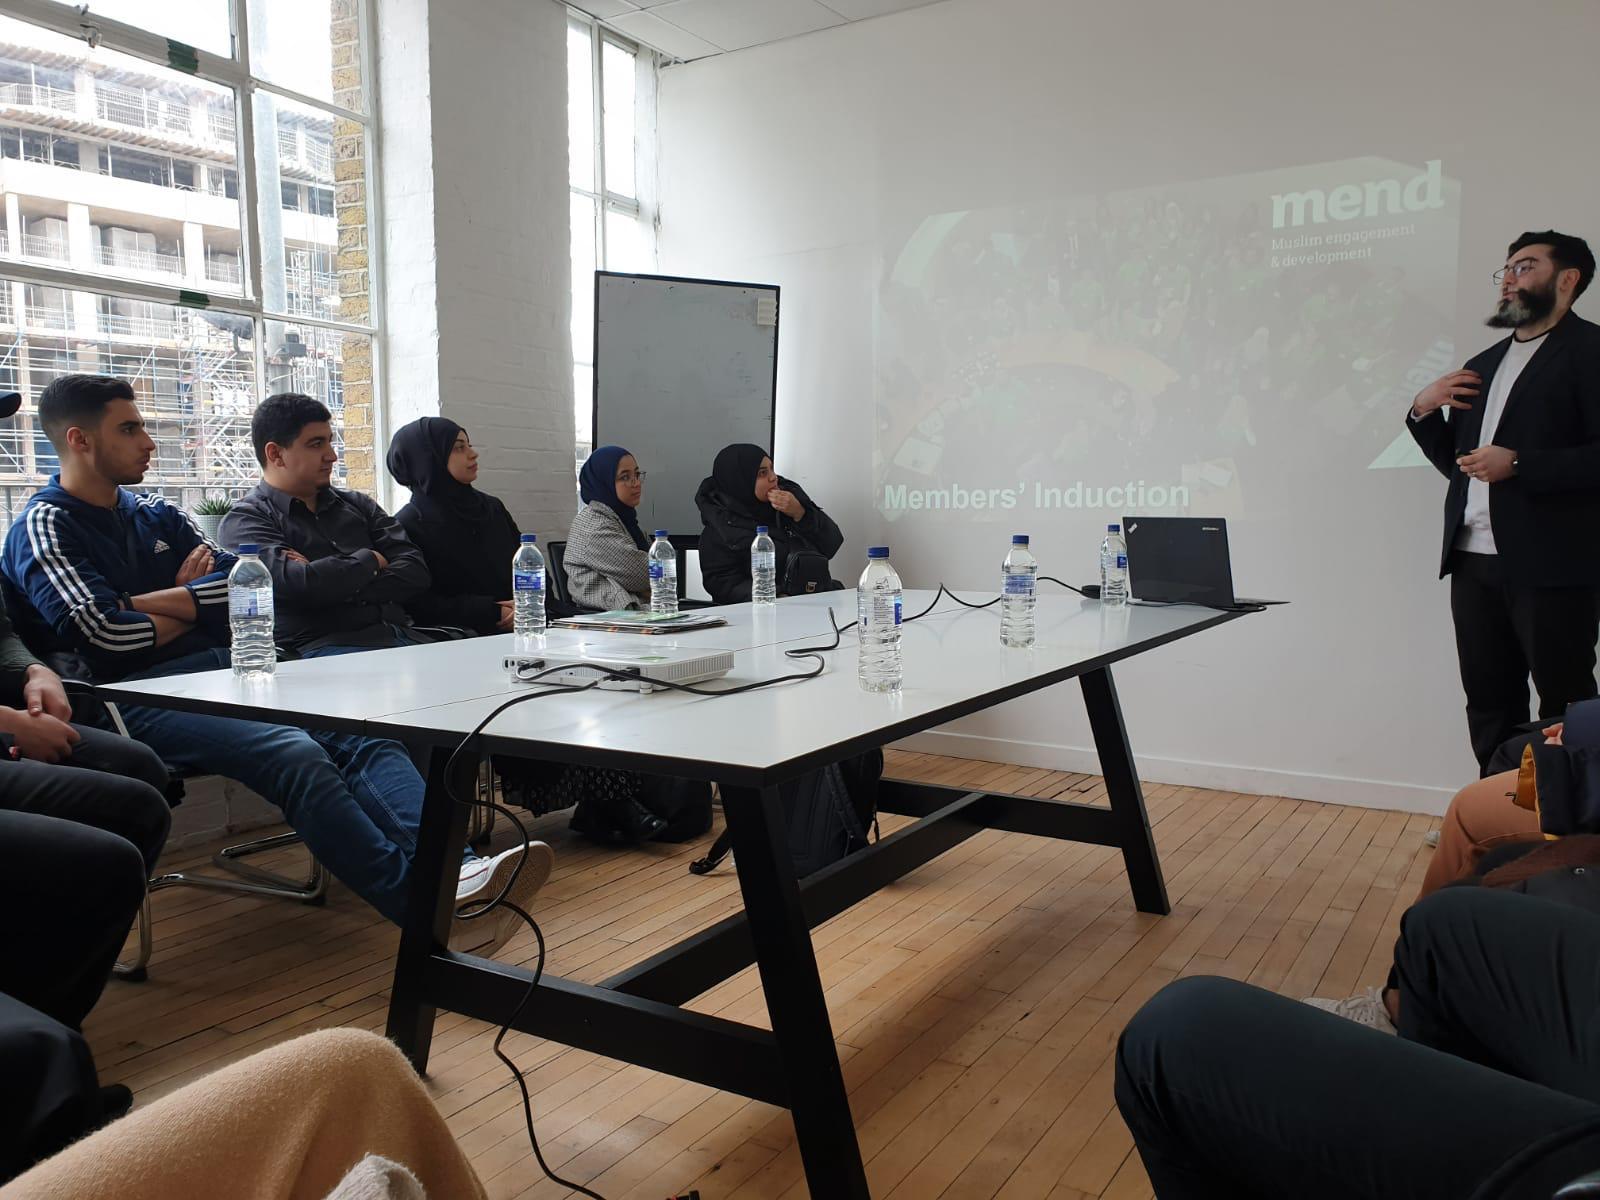 Belgium Students Meeting